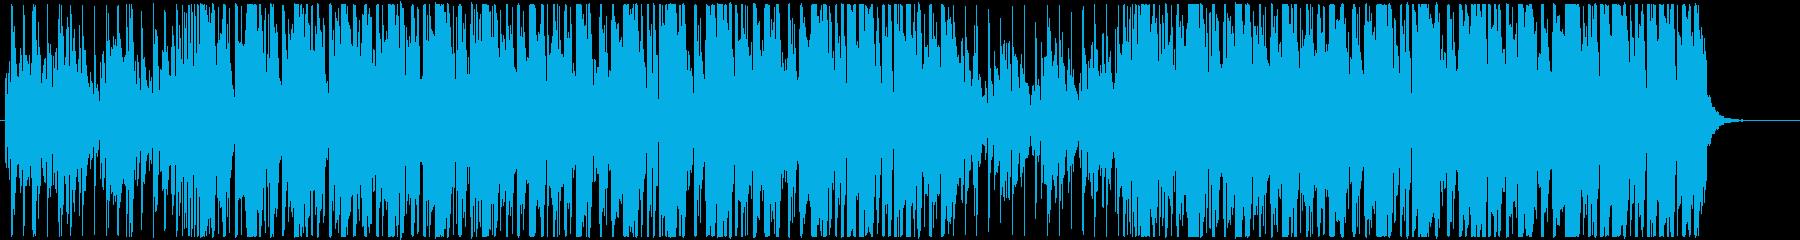 K-POPディスコ調ポップBGMの再生済みの波形